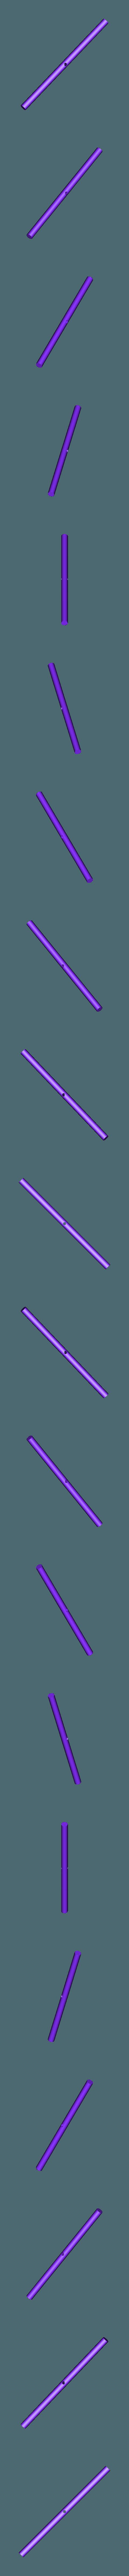 axis_cylinder.STL Download free STL file hyperbolic table experiment • 3D printer design, Pudedrik